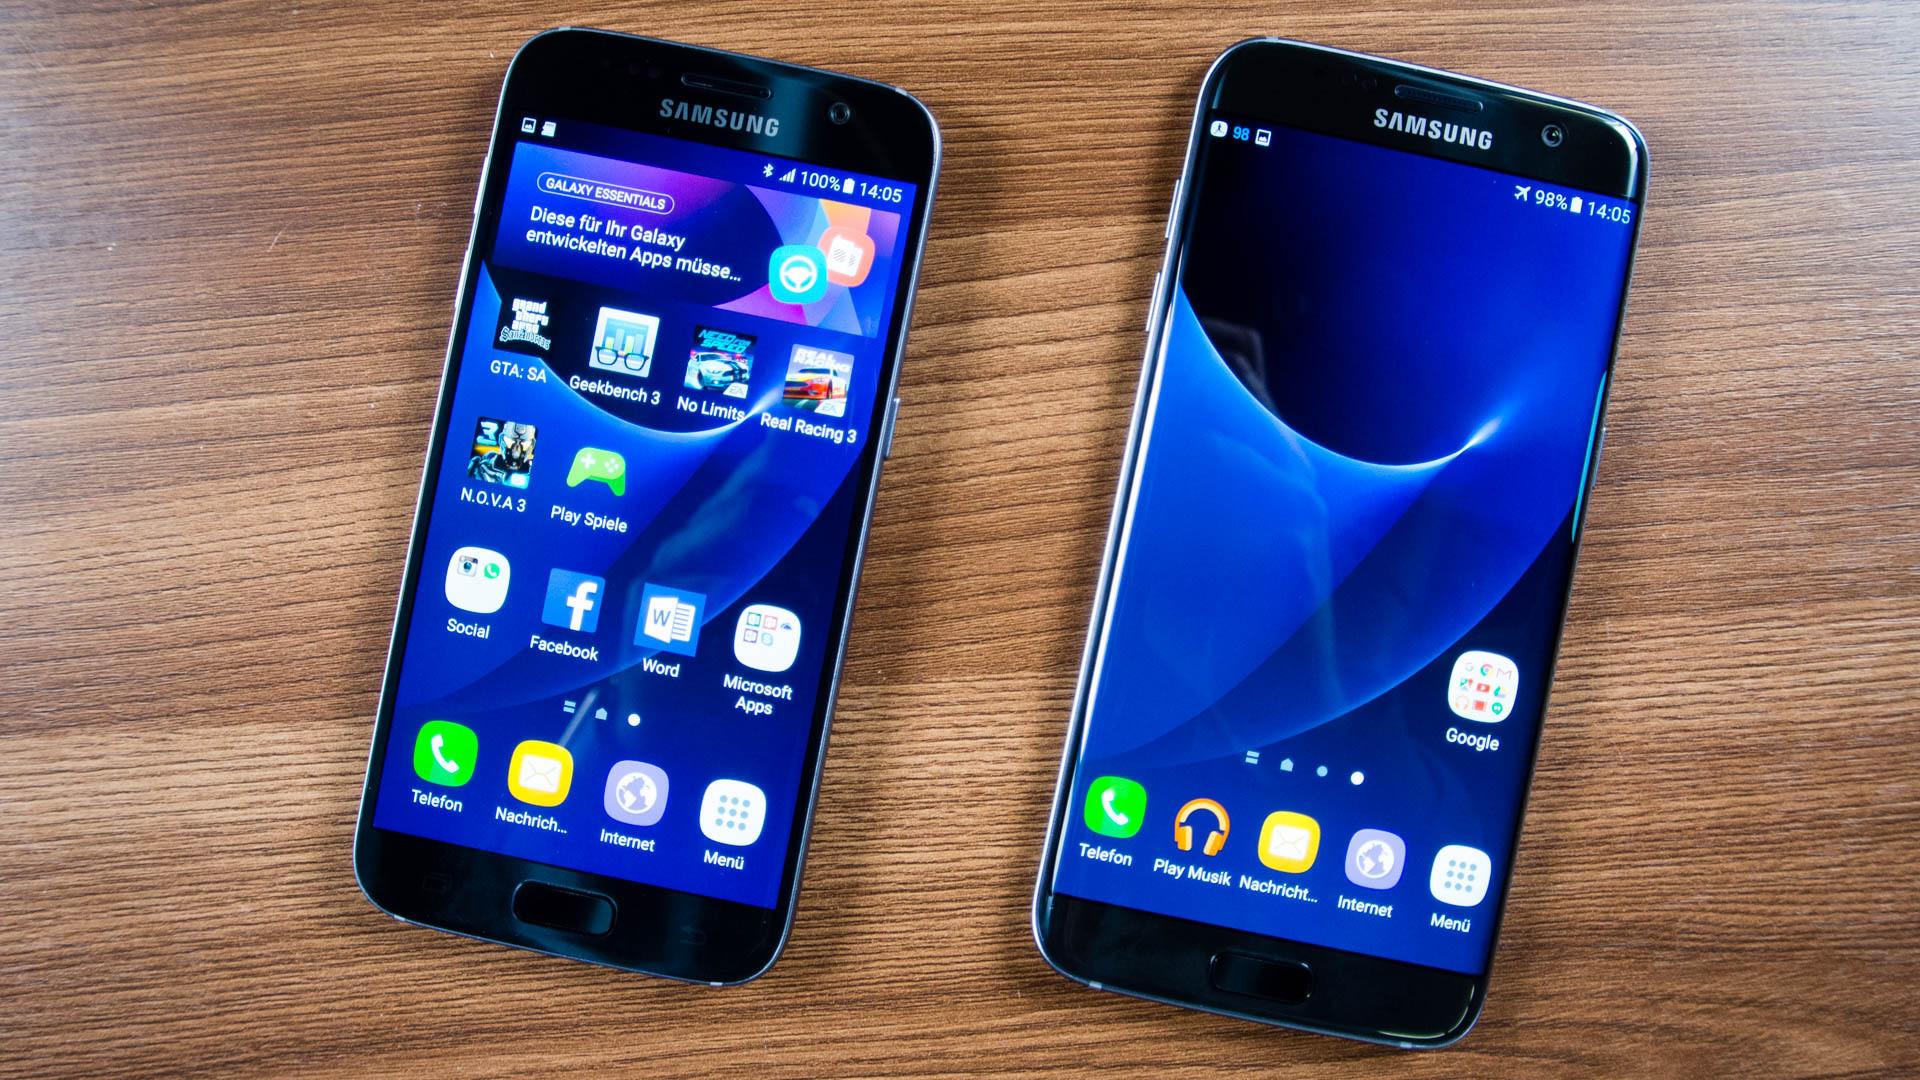 Gerüchte zum Galaxy S8: Samsung-KI, gebogenes Display, Dual-Kamera, ab April